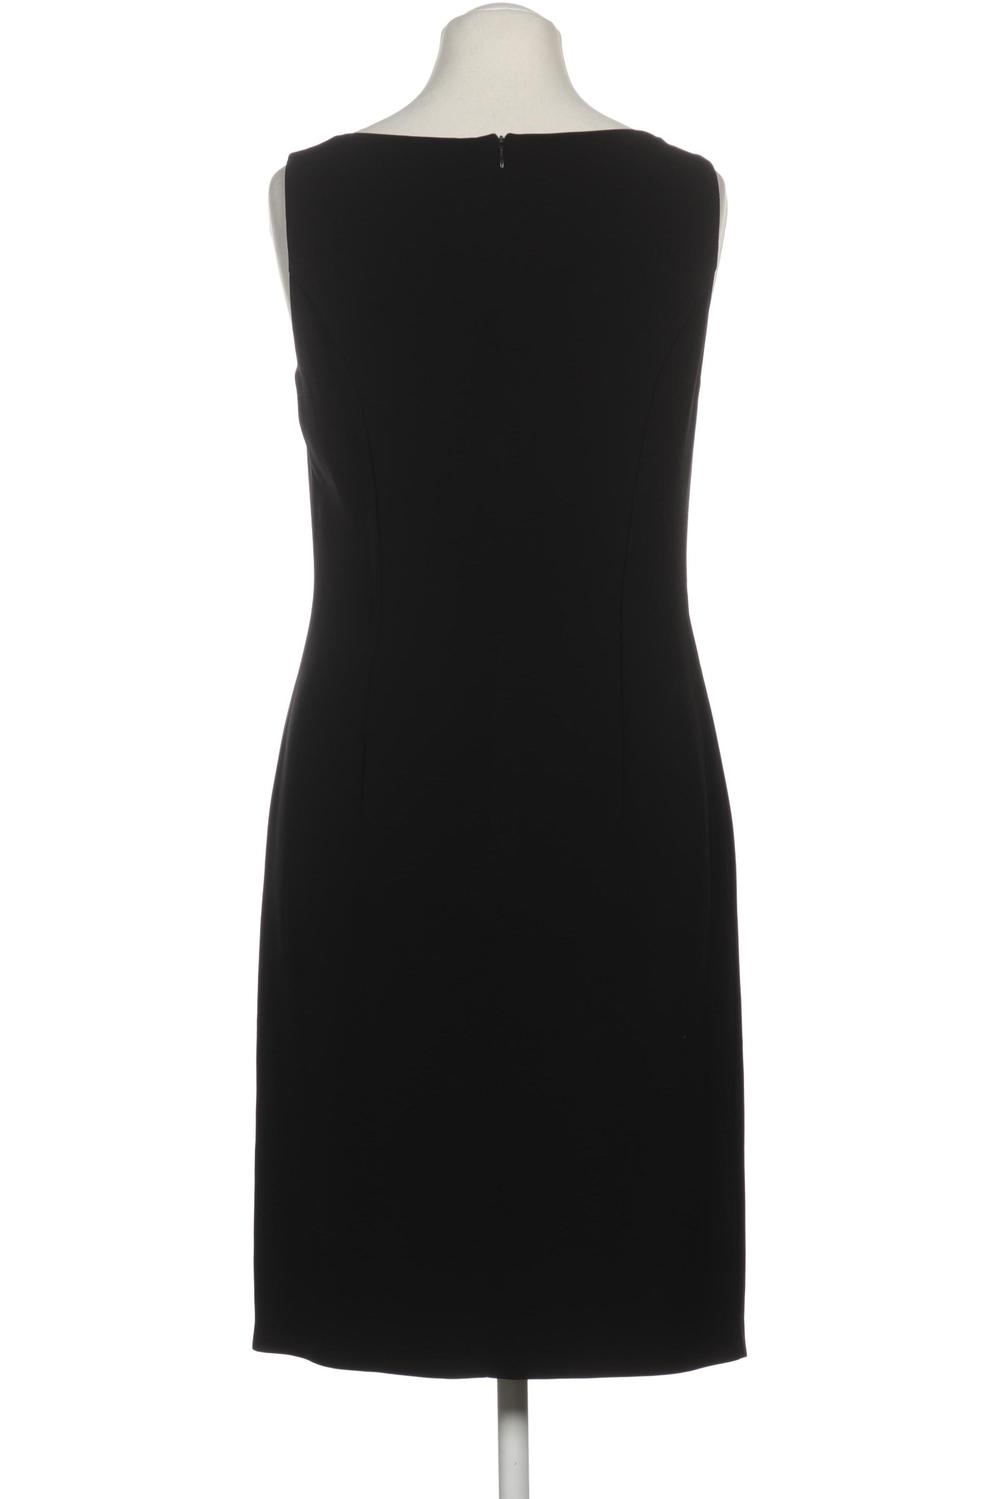 Vera Mont Damen Kleid DE 40 Second Hand kaufen | ubup